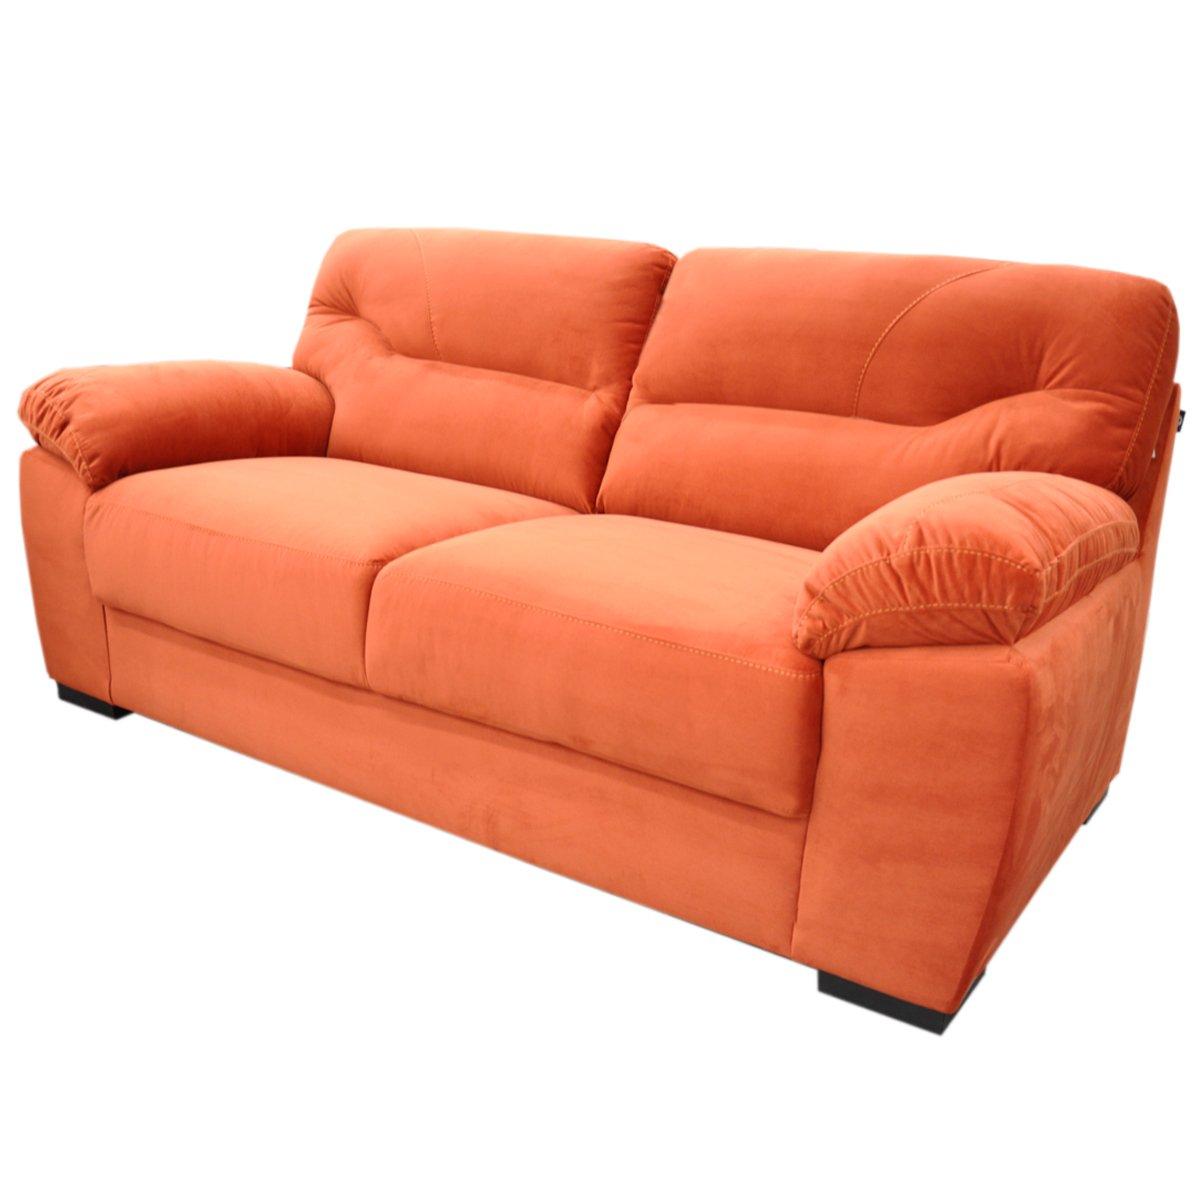 Sof cartagena tapizado tela persimon sears com mx me entiende - Tela tapizado sofa ...